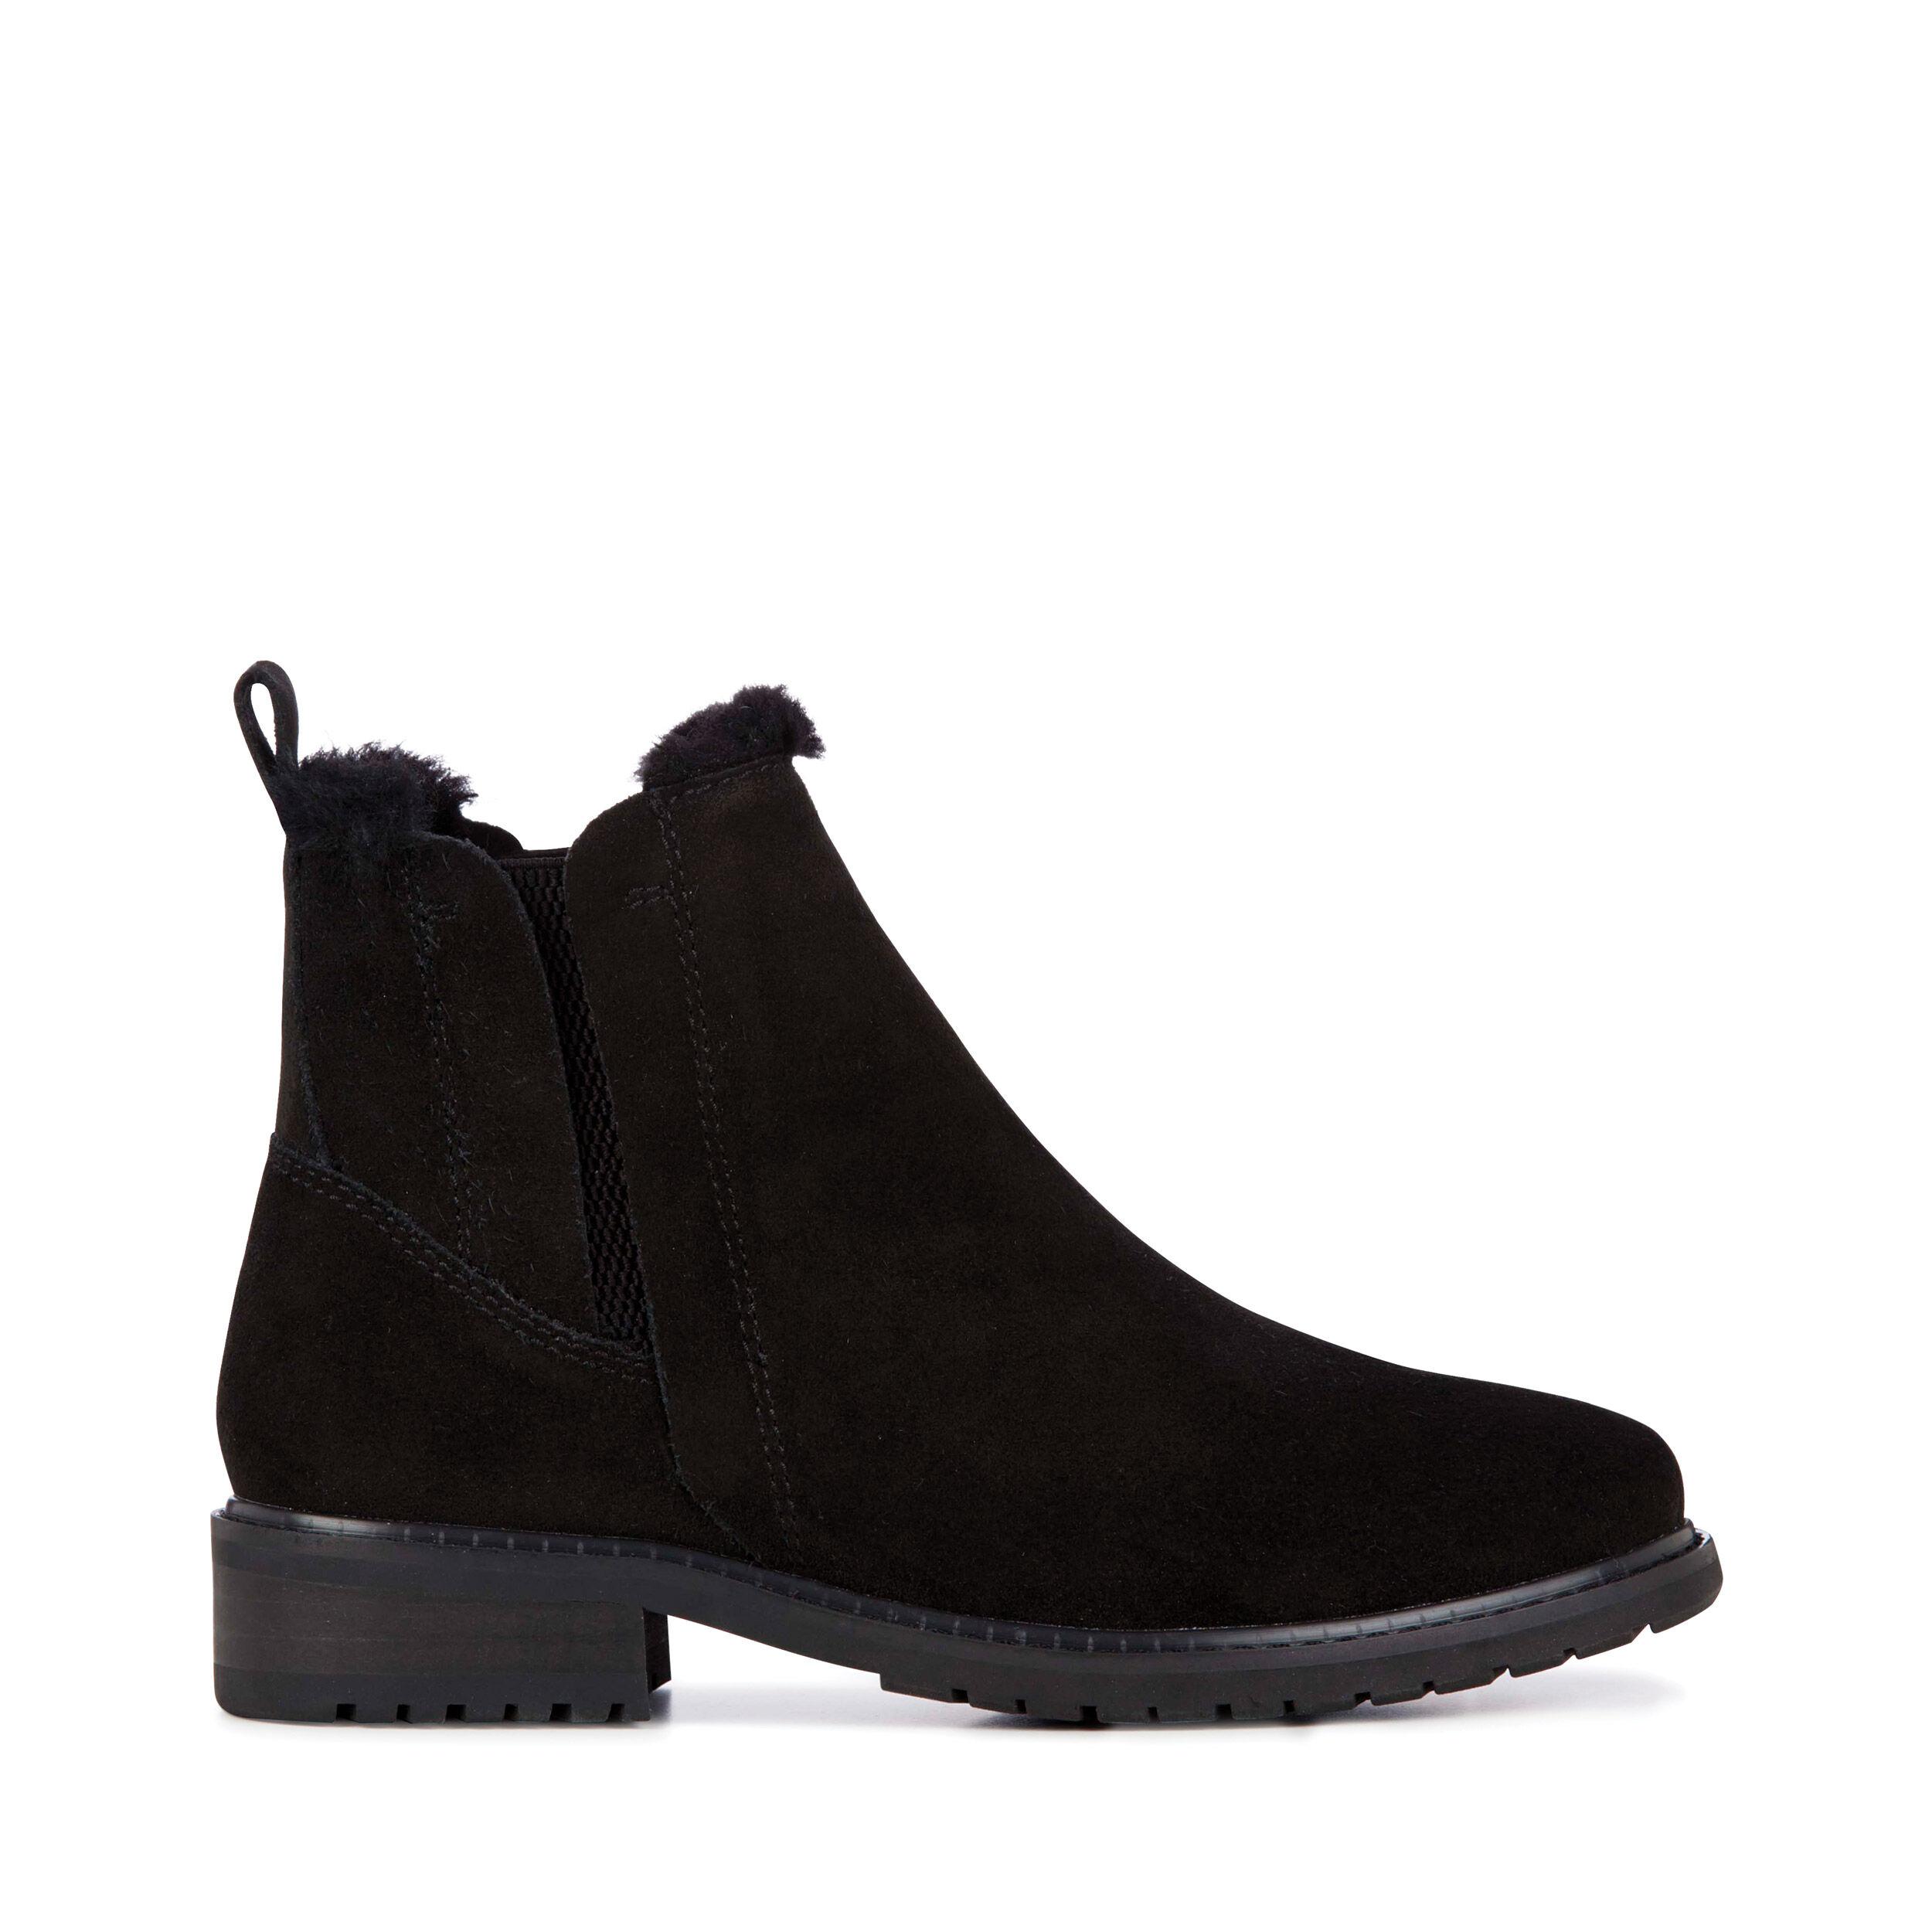 Dr. Martens – Boots '1460 W' in Lackoptik – Schwarz